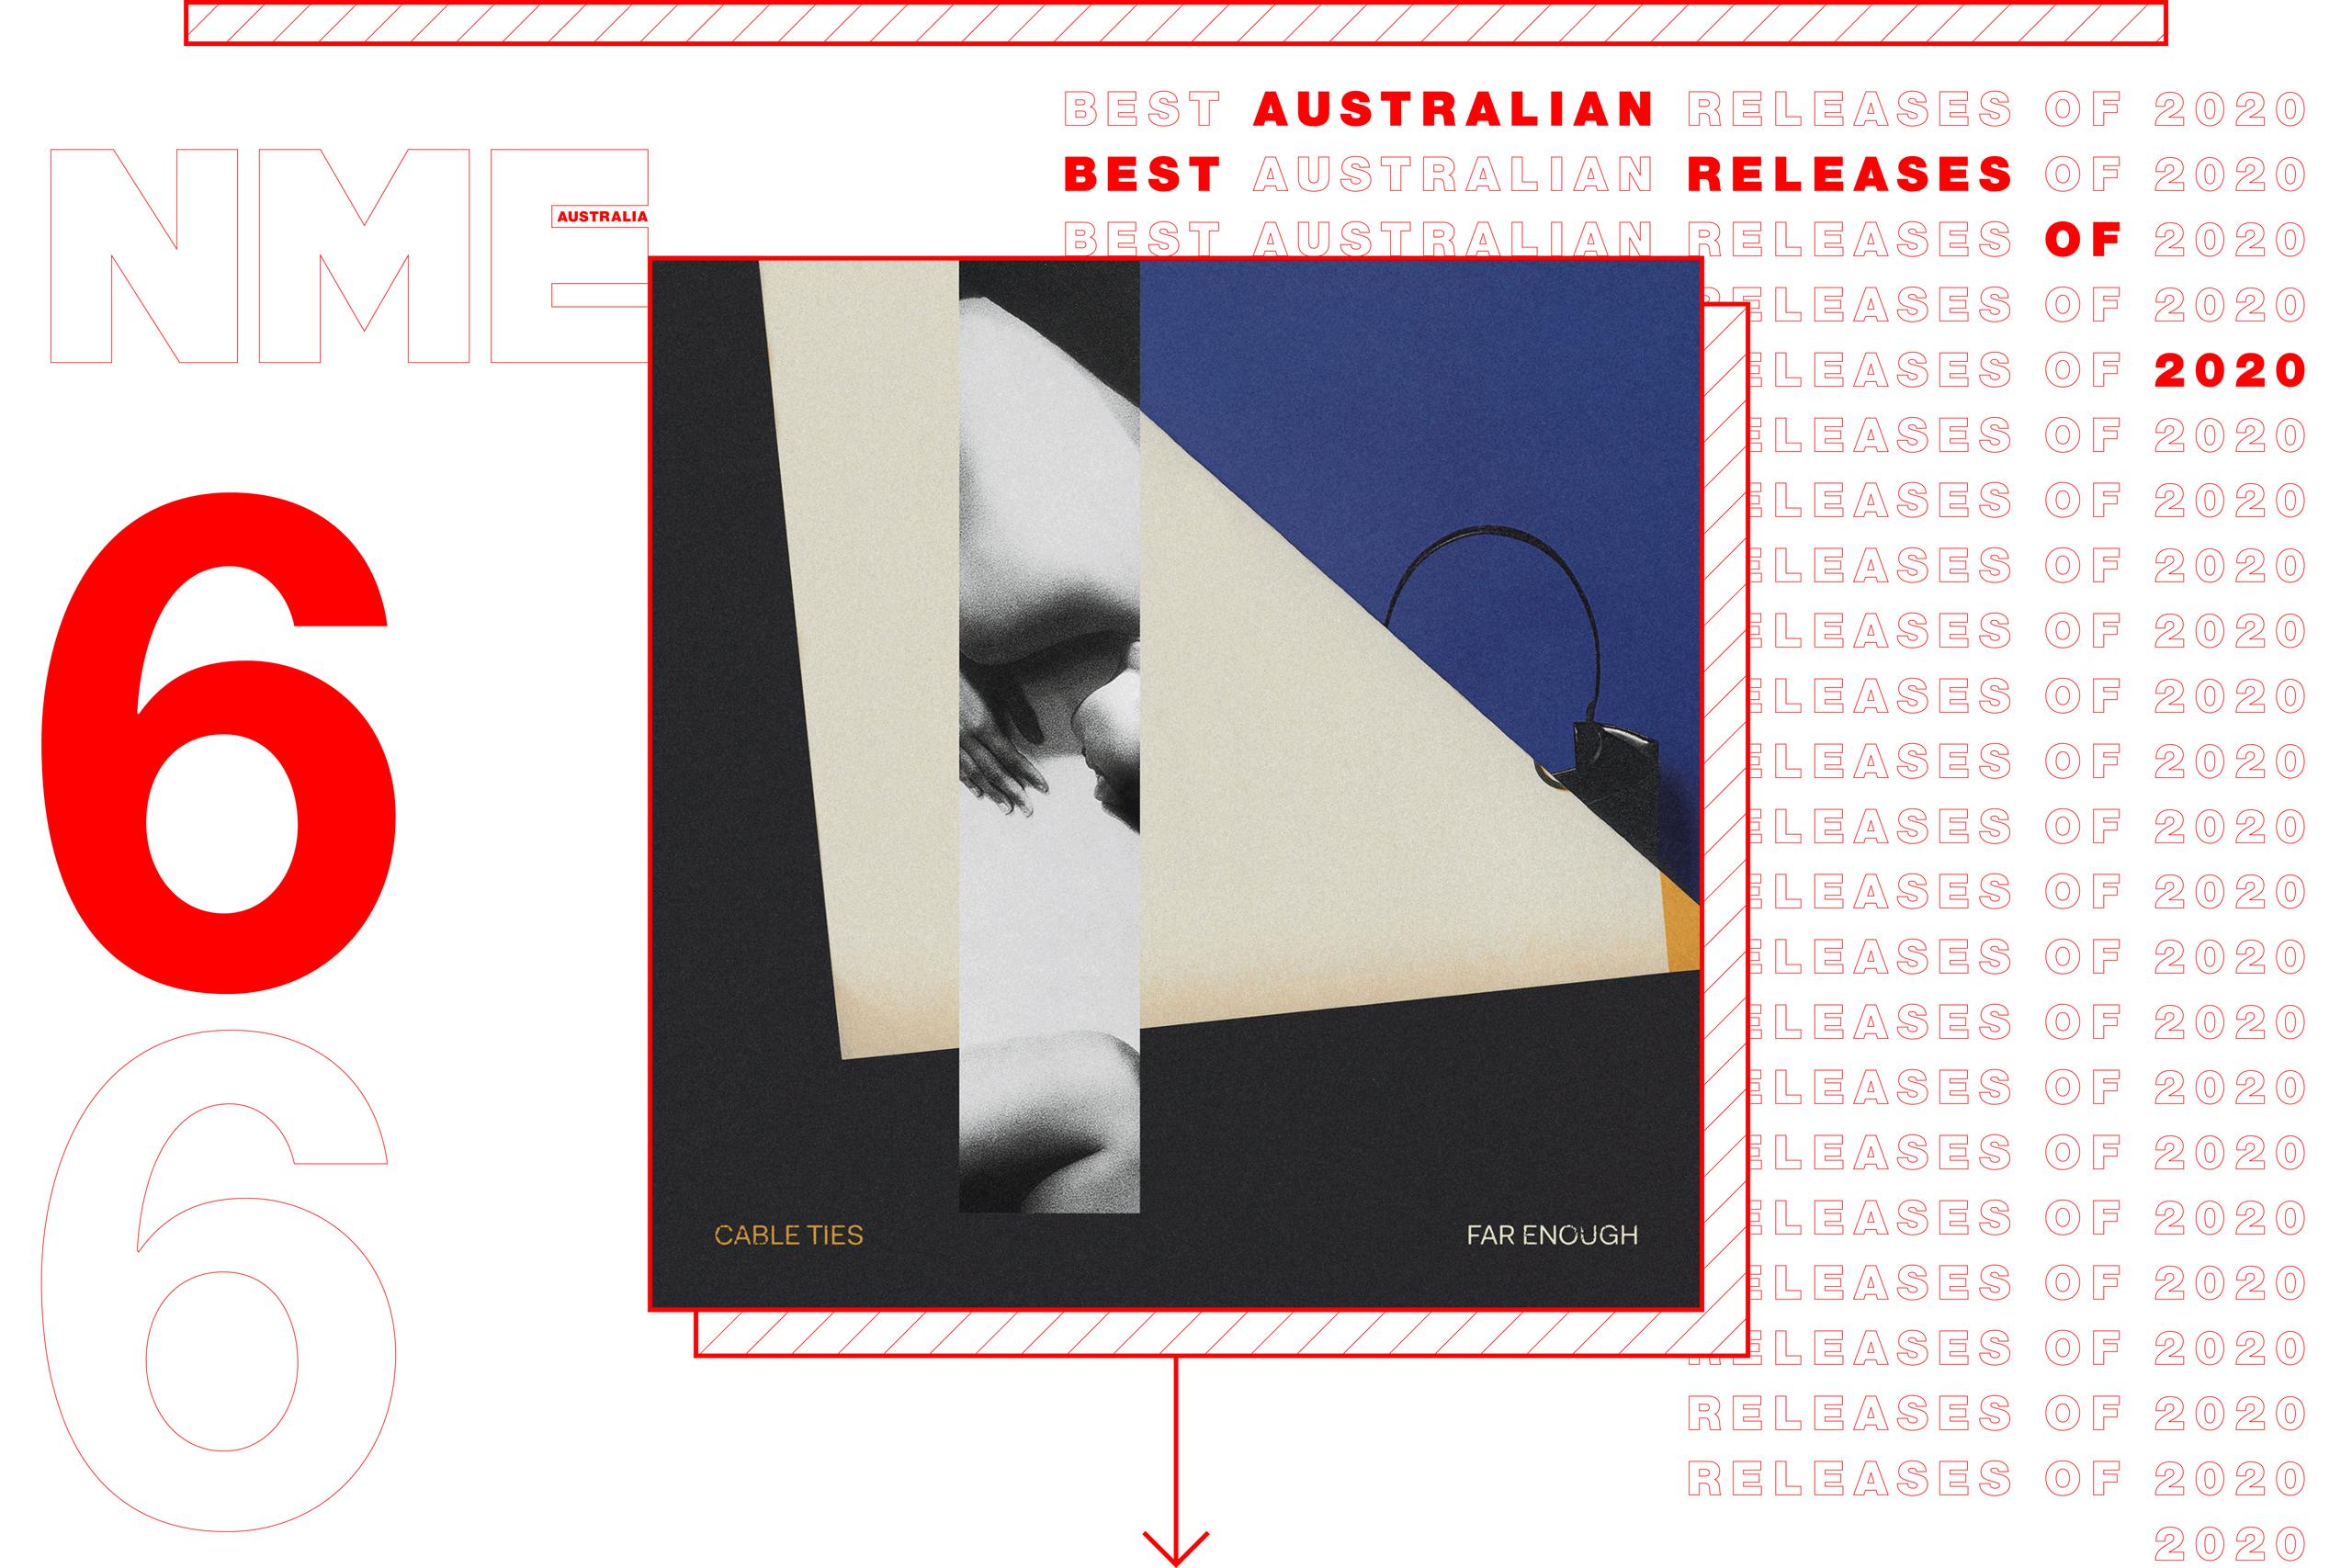 NME Australian Album Release 6